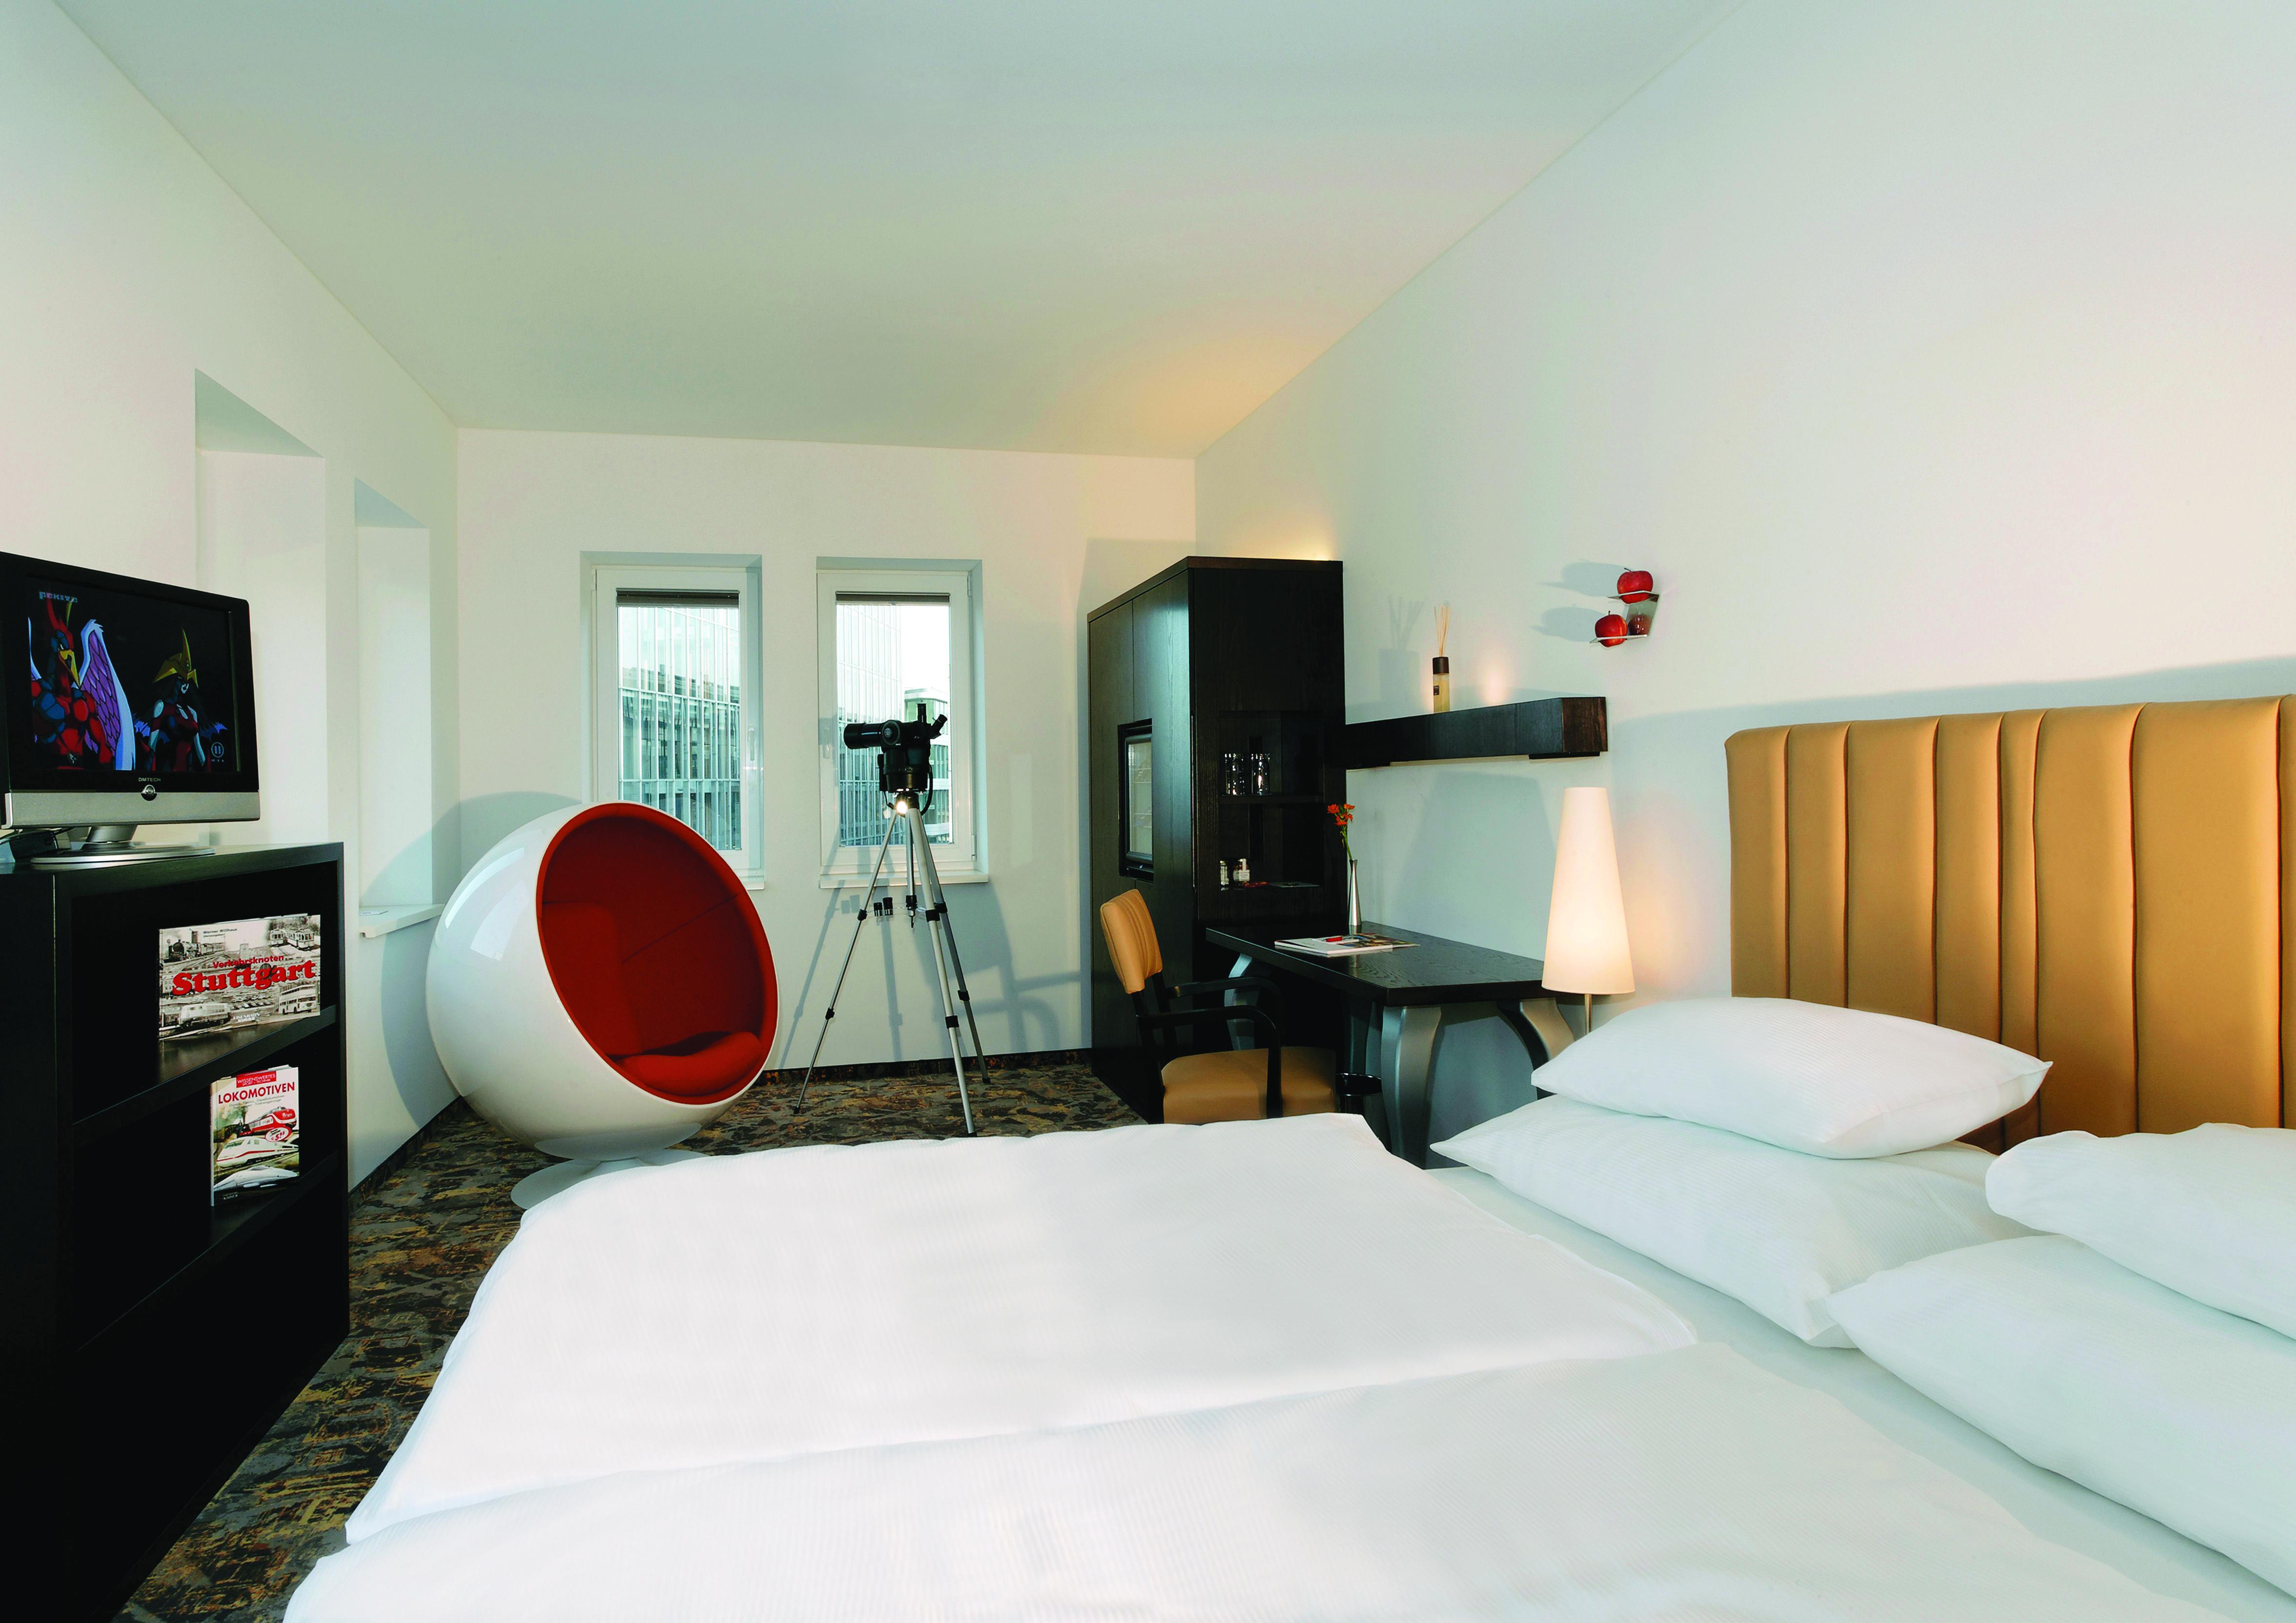 Themenzimmer Schaustellen Themed Room Project 21 Haus Deko Zimmer Themen Hotel